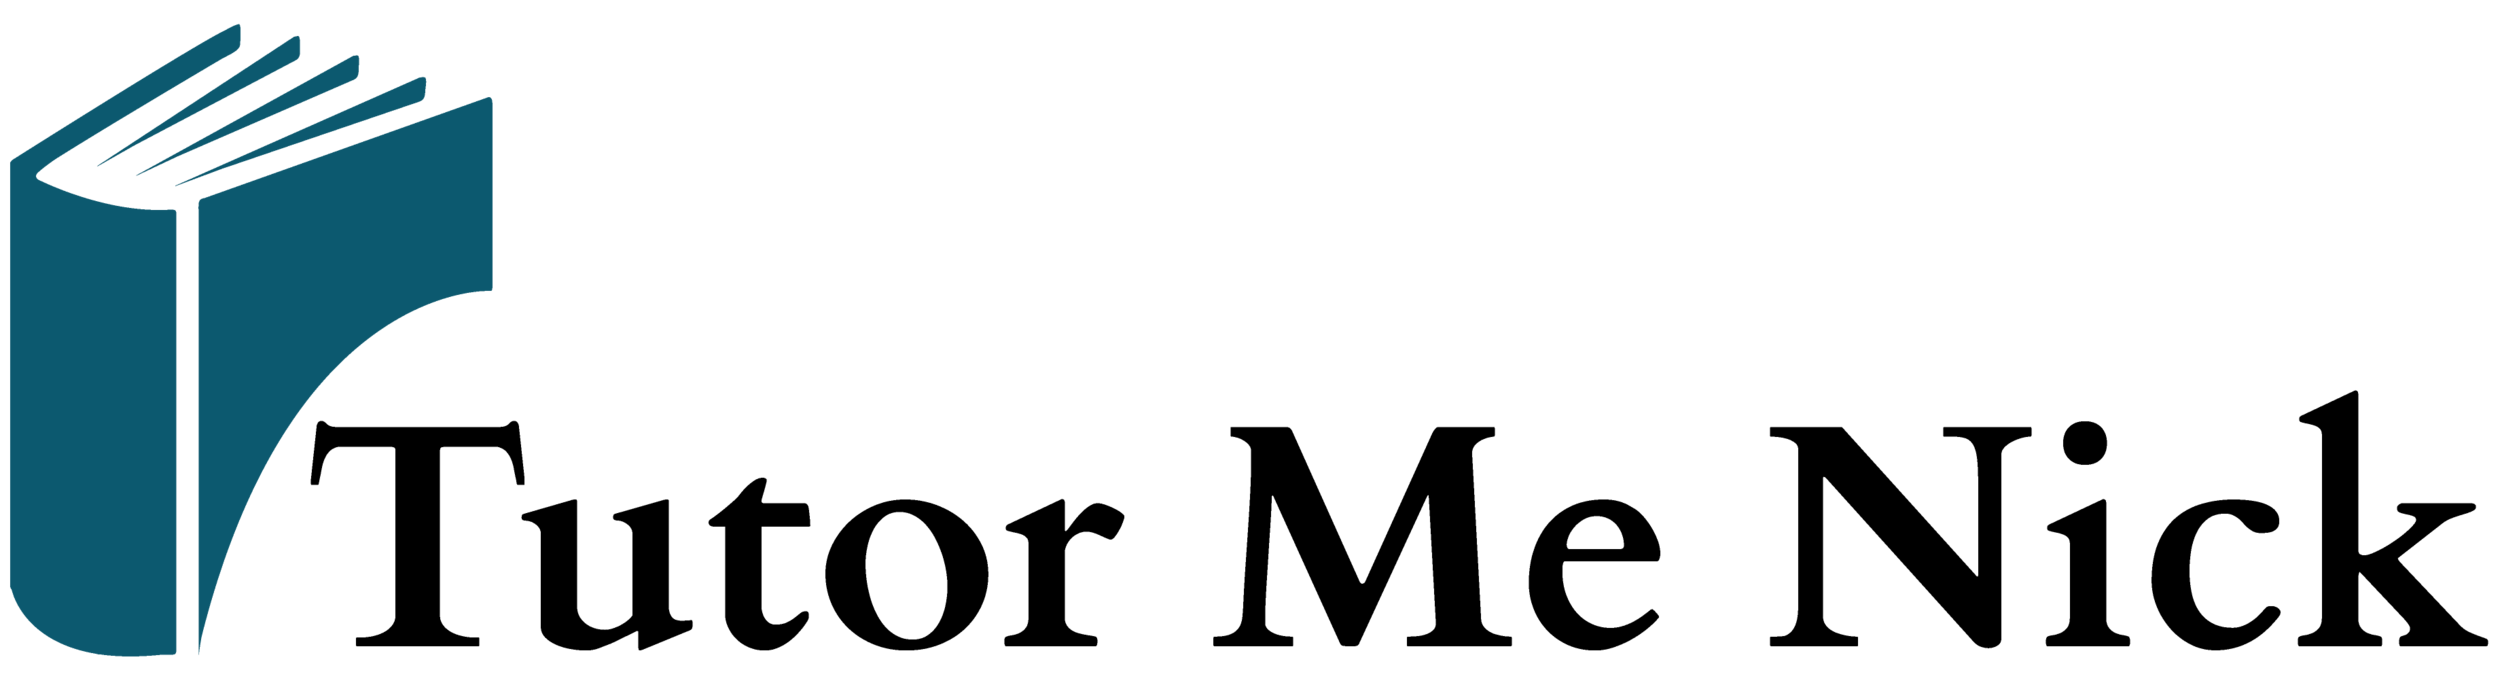 tutormenick logo.png